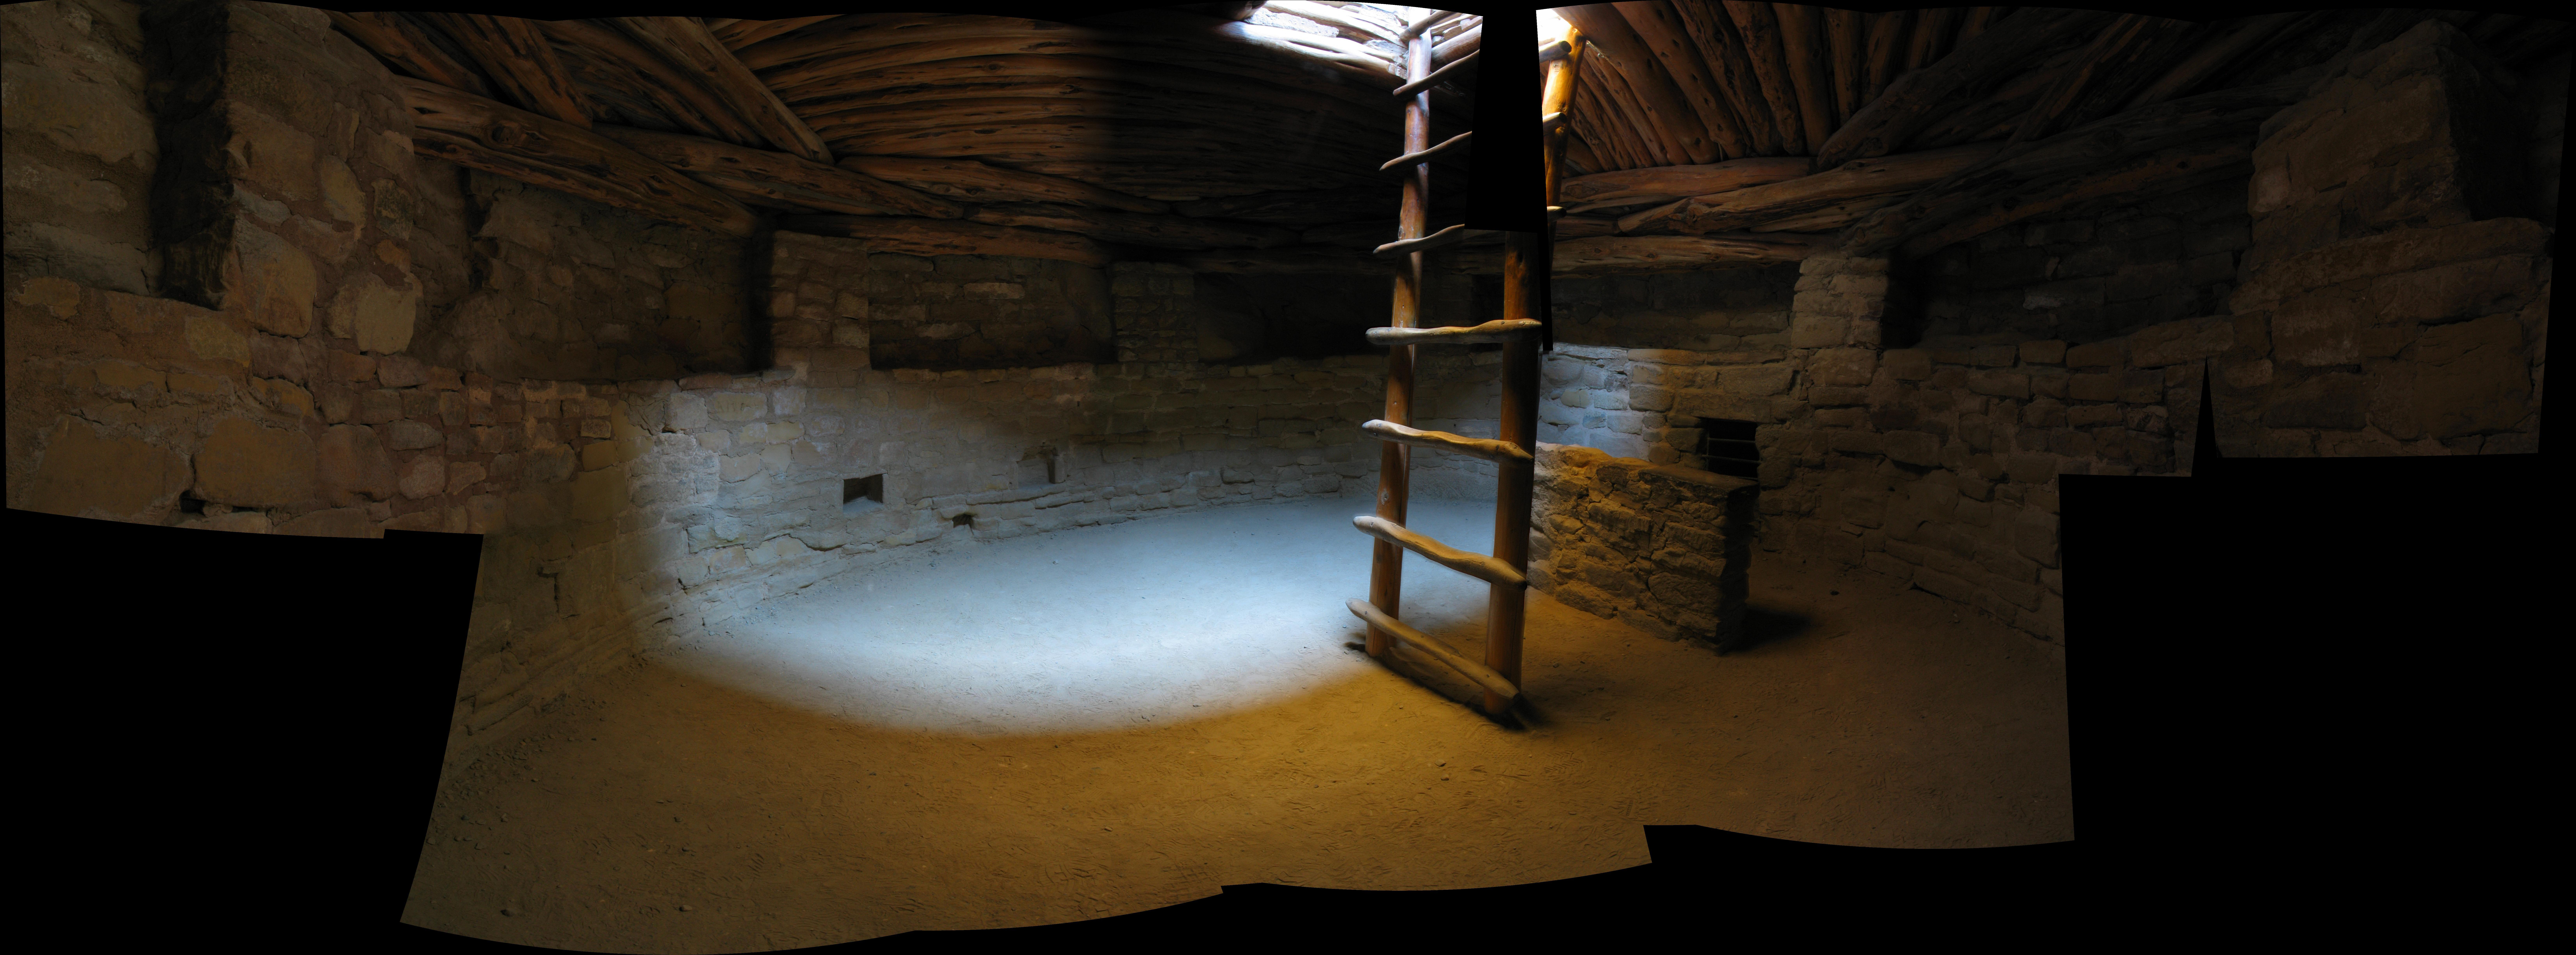 Interior of a reconstructed kiva at Mesa Verde National Park.